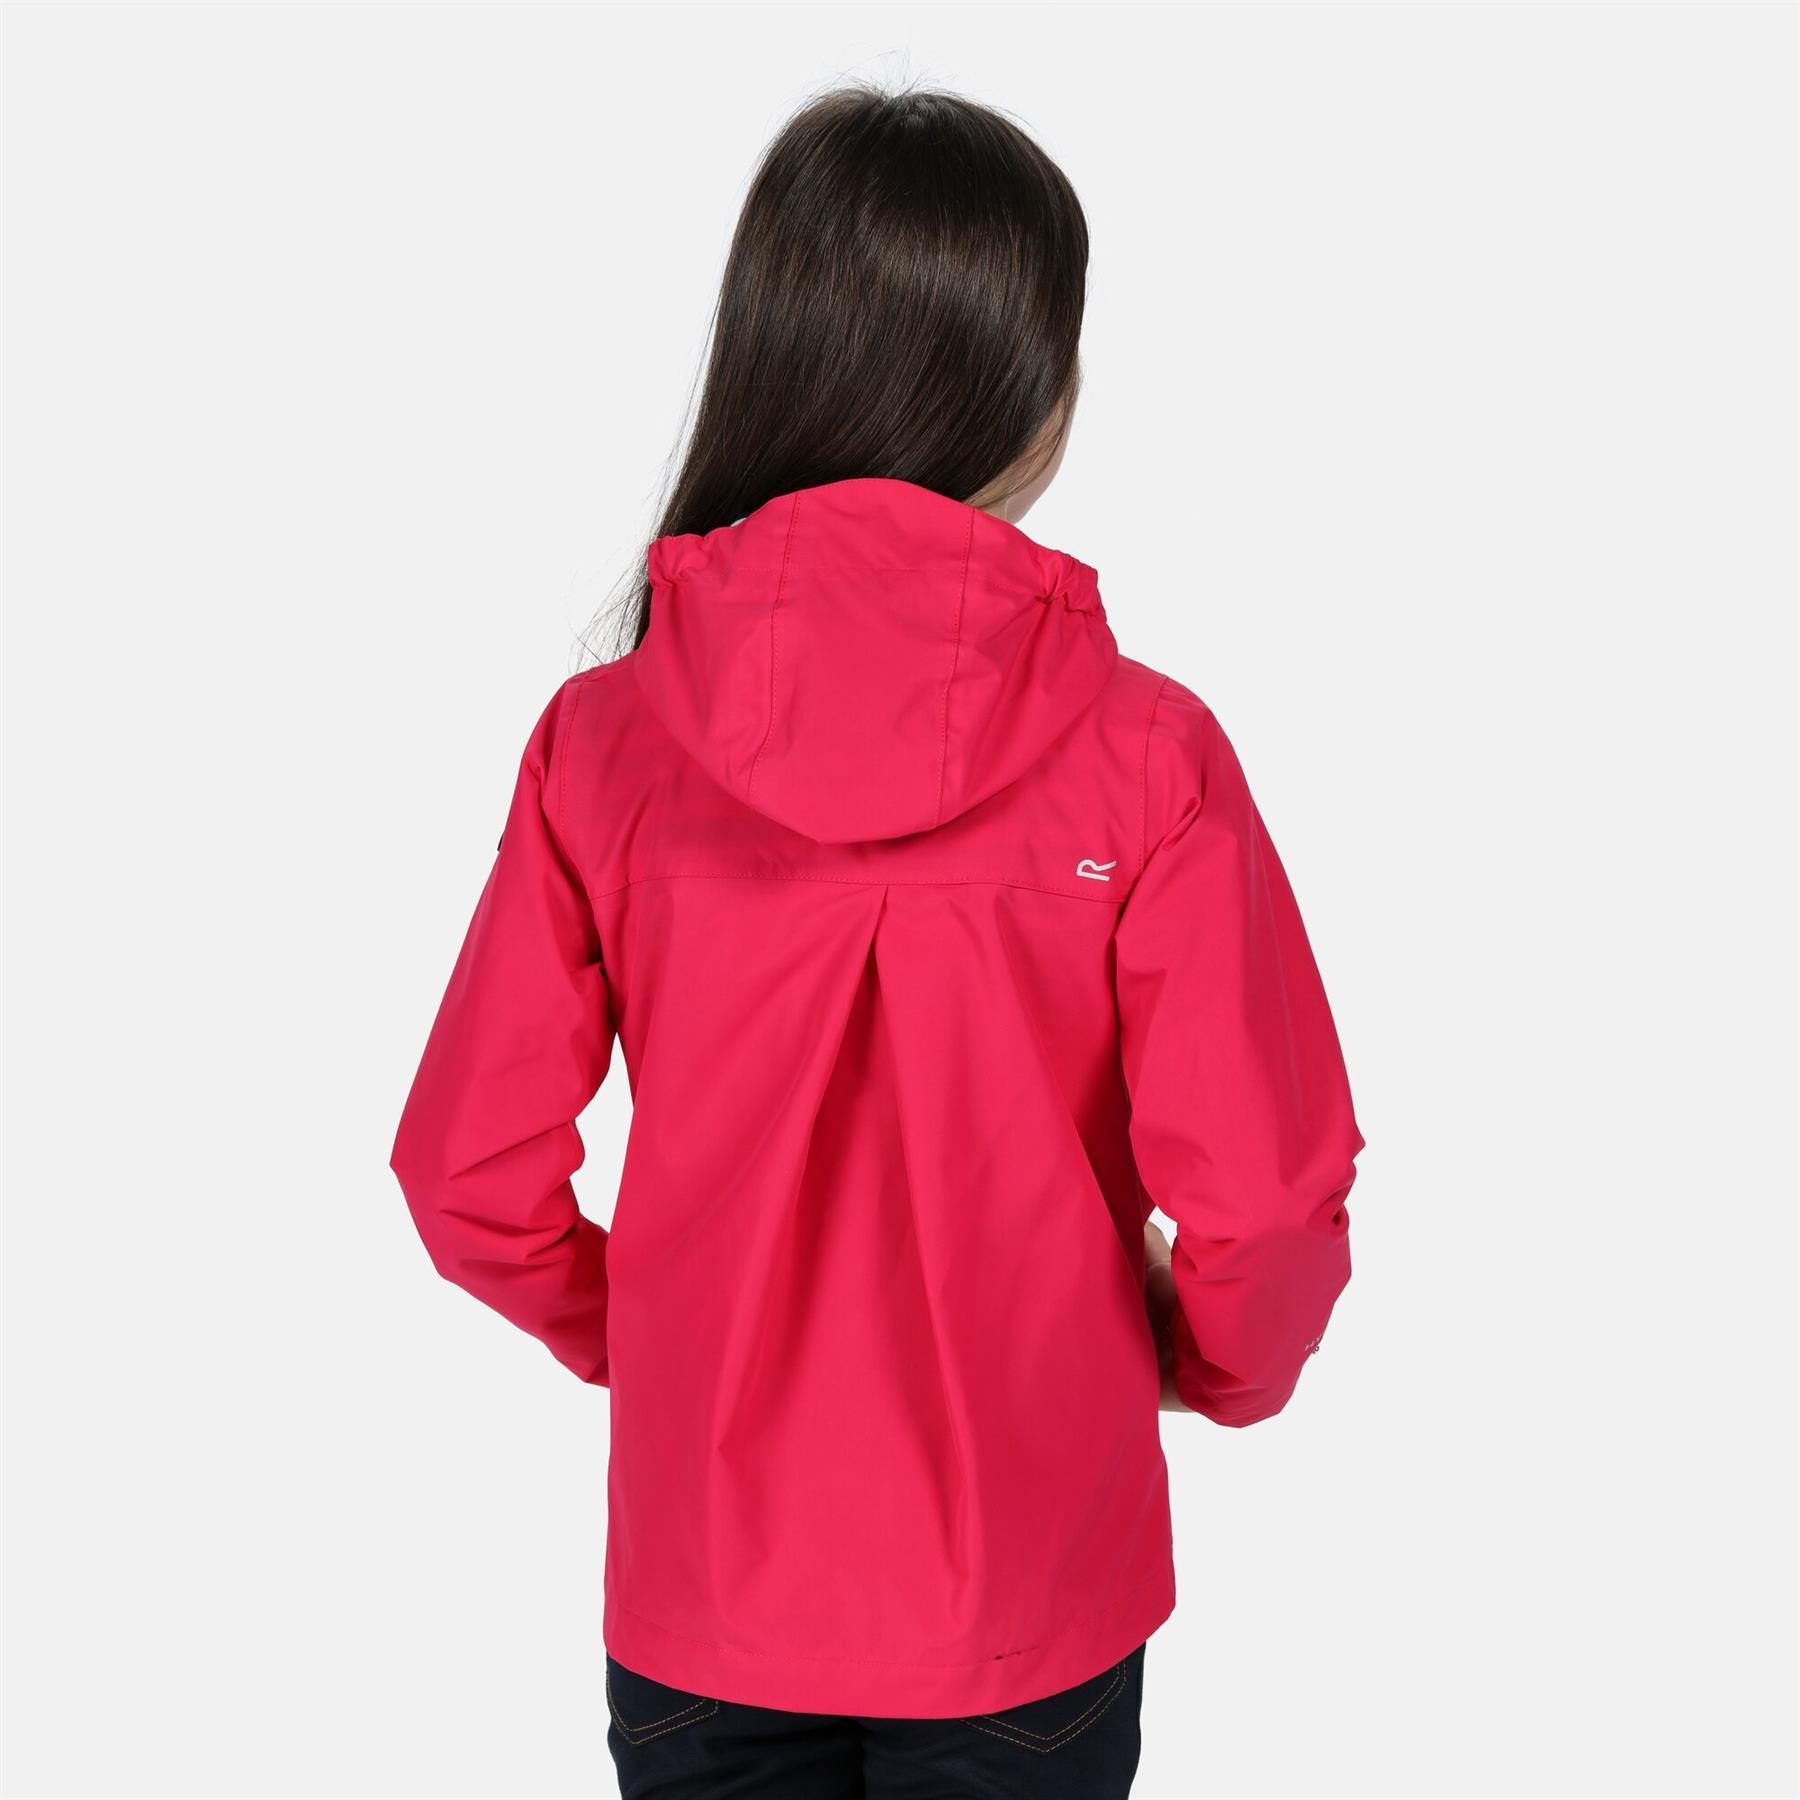 miniatuur 5 - Regatta Kids Bibiana Waterproof Hooded Zip Jacket Girls Boys Rain Coat